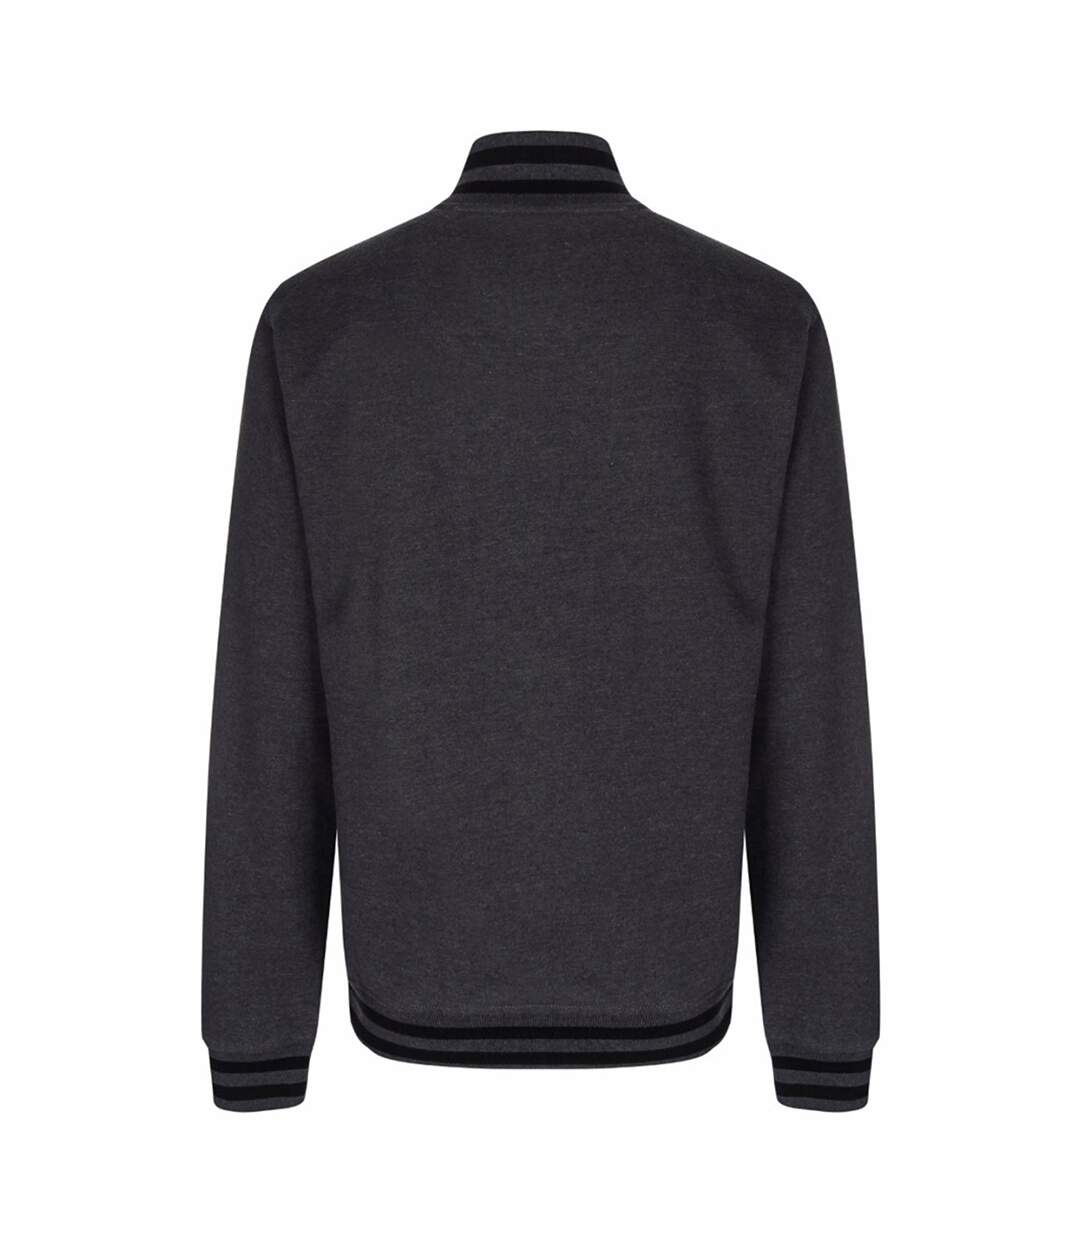 FDM Unisex Campus Varsity Jacket (Charcoal/Black) - UTBC3182